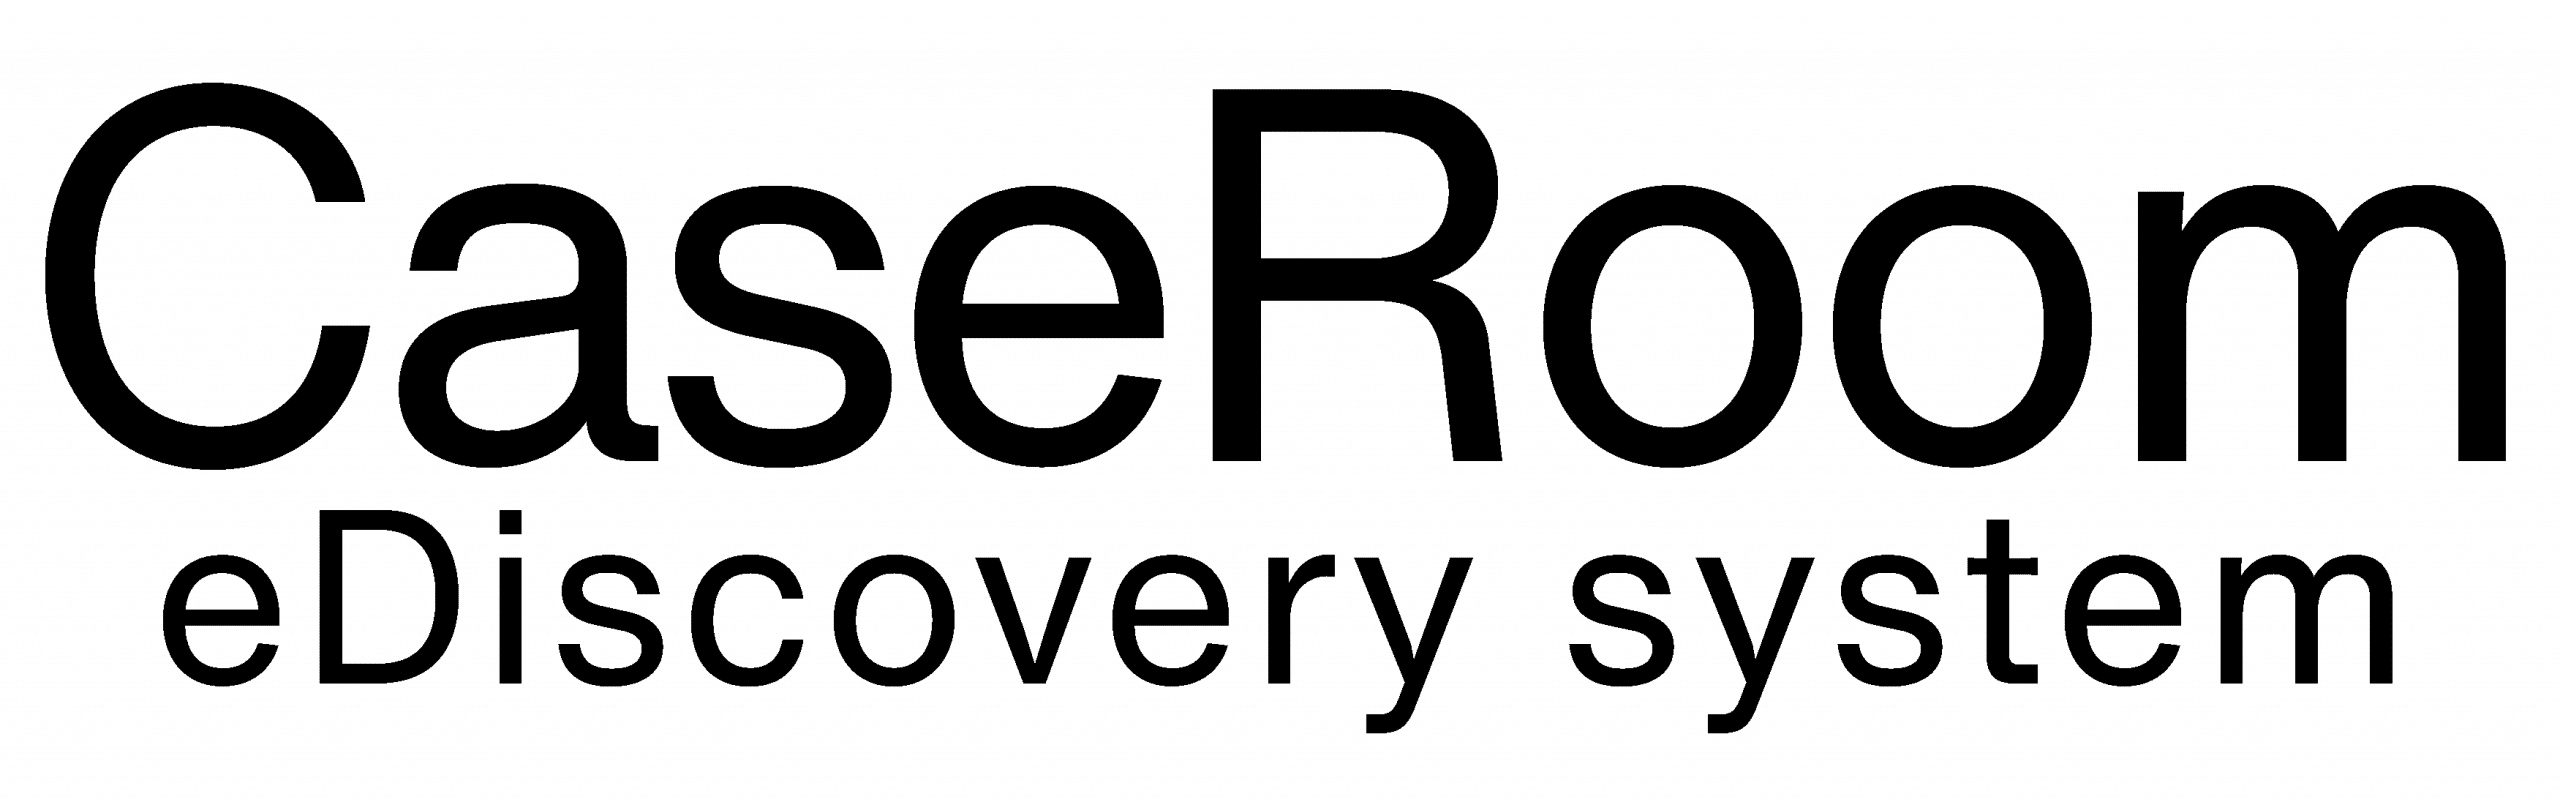 CaseRoom eDiscovery System